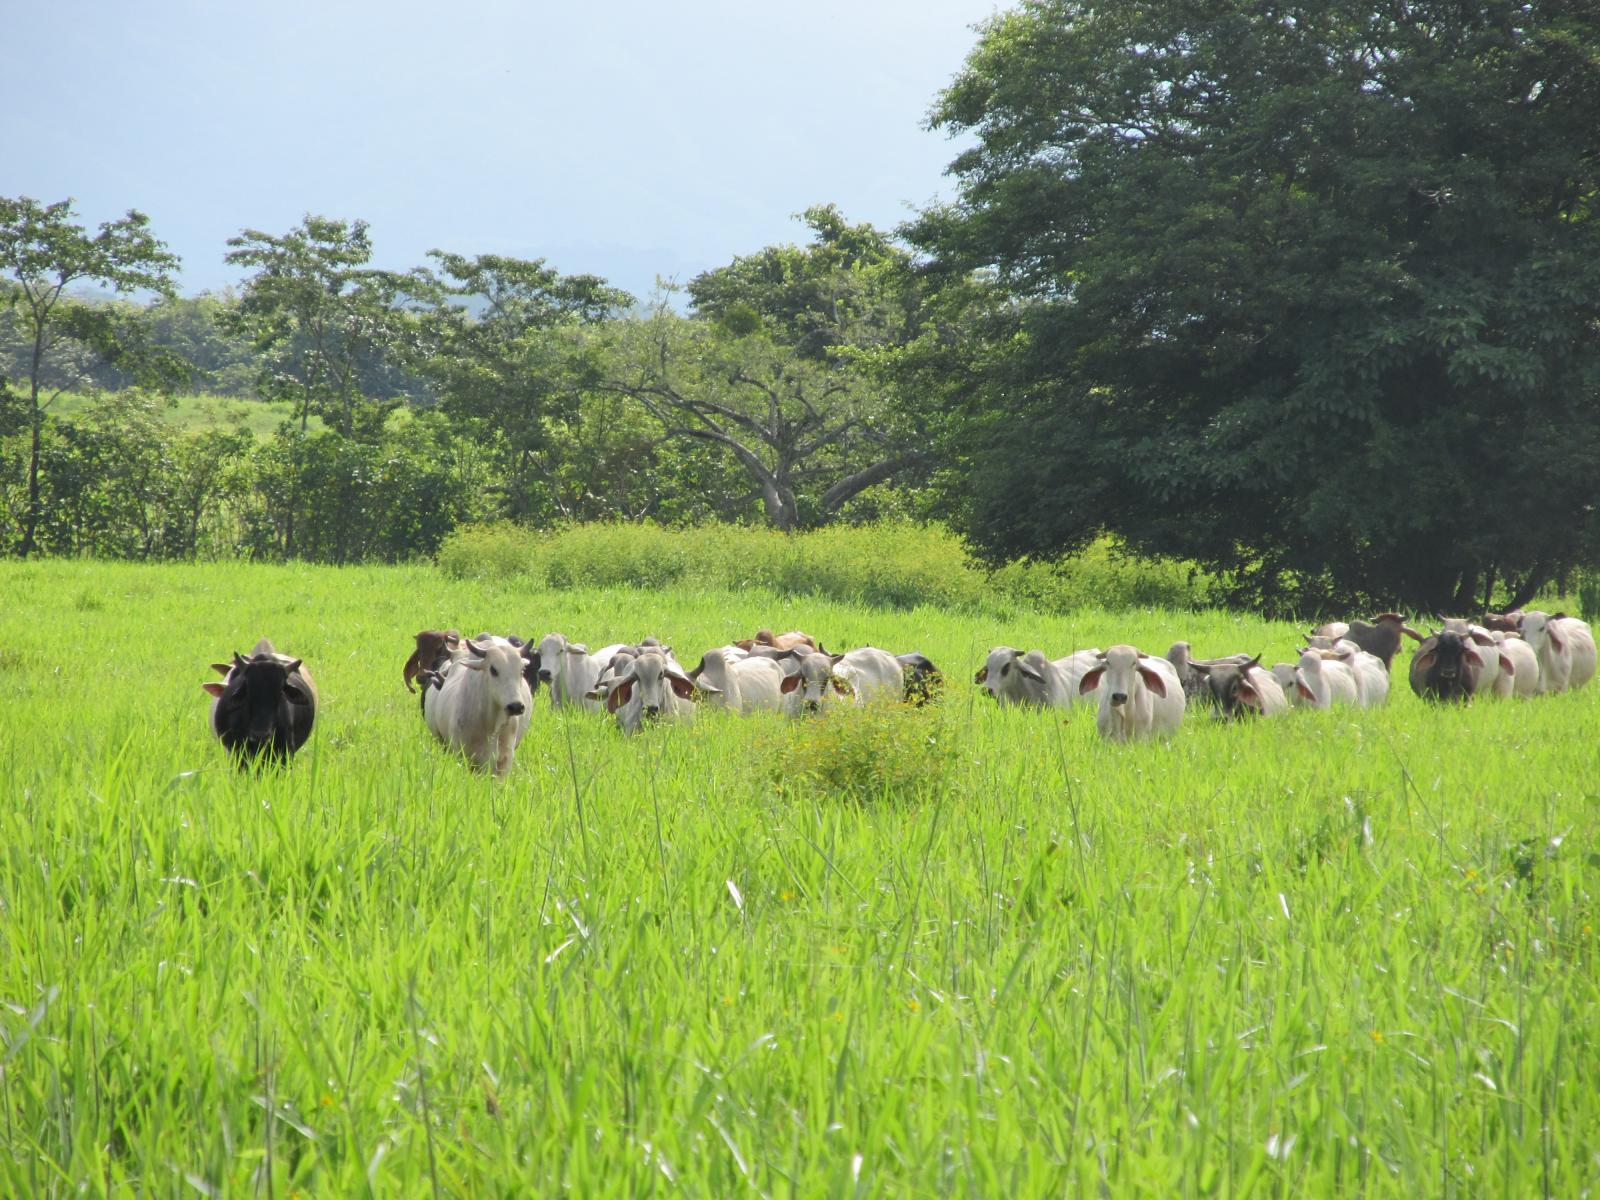 Some Brahman bulls